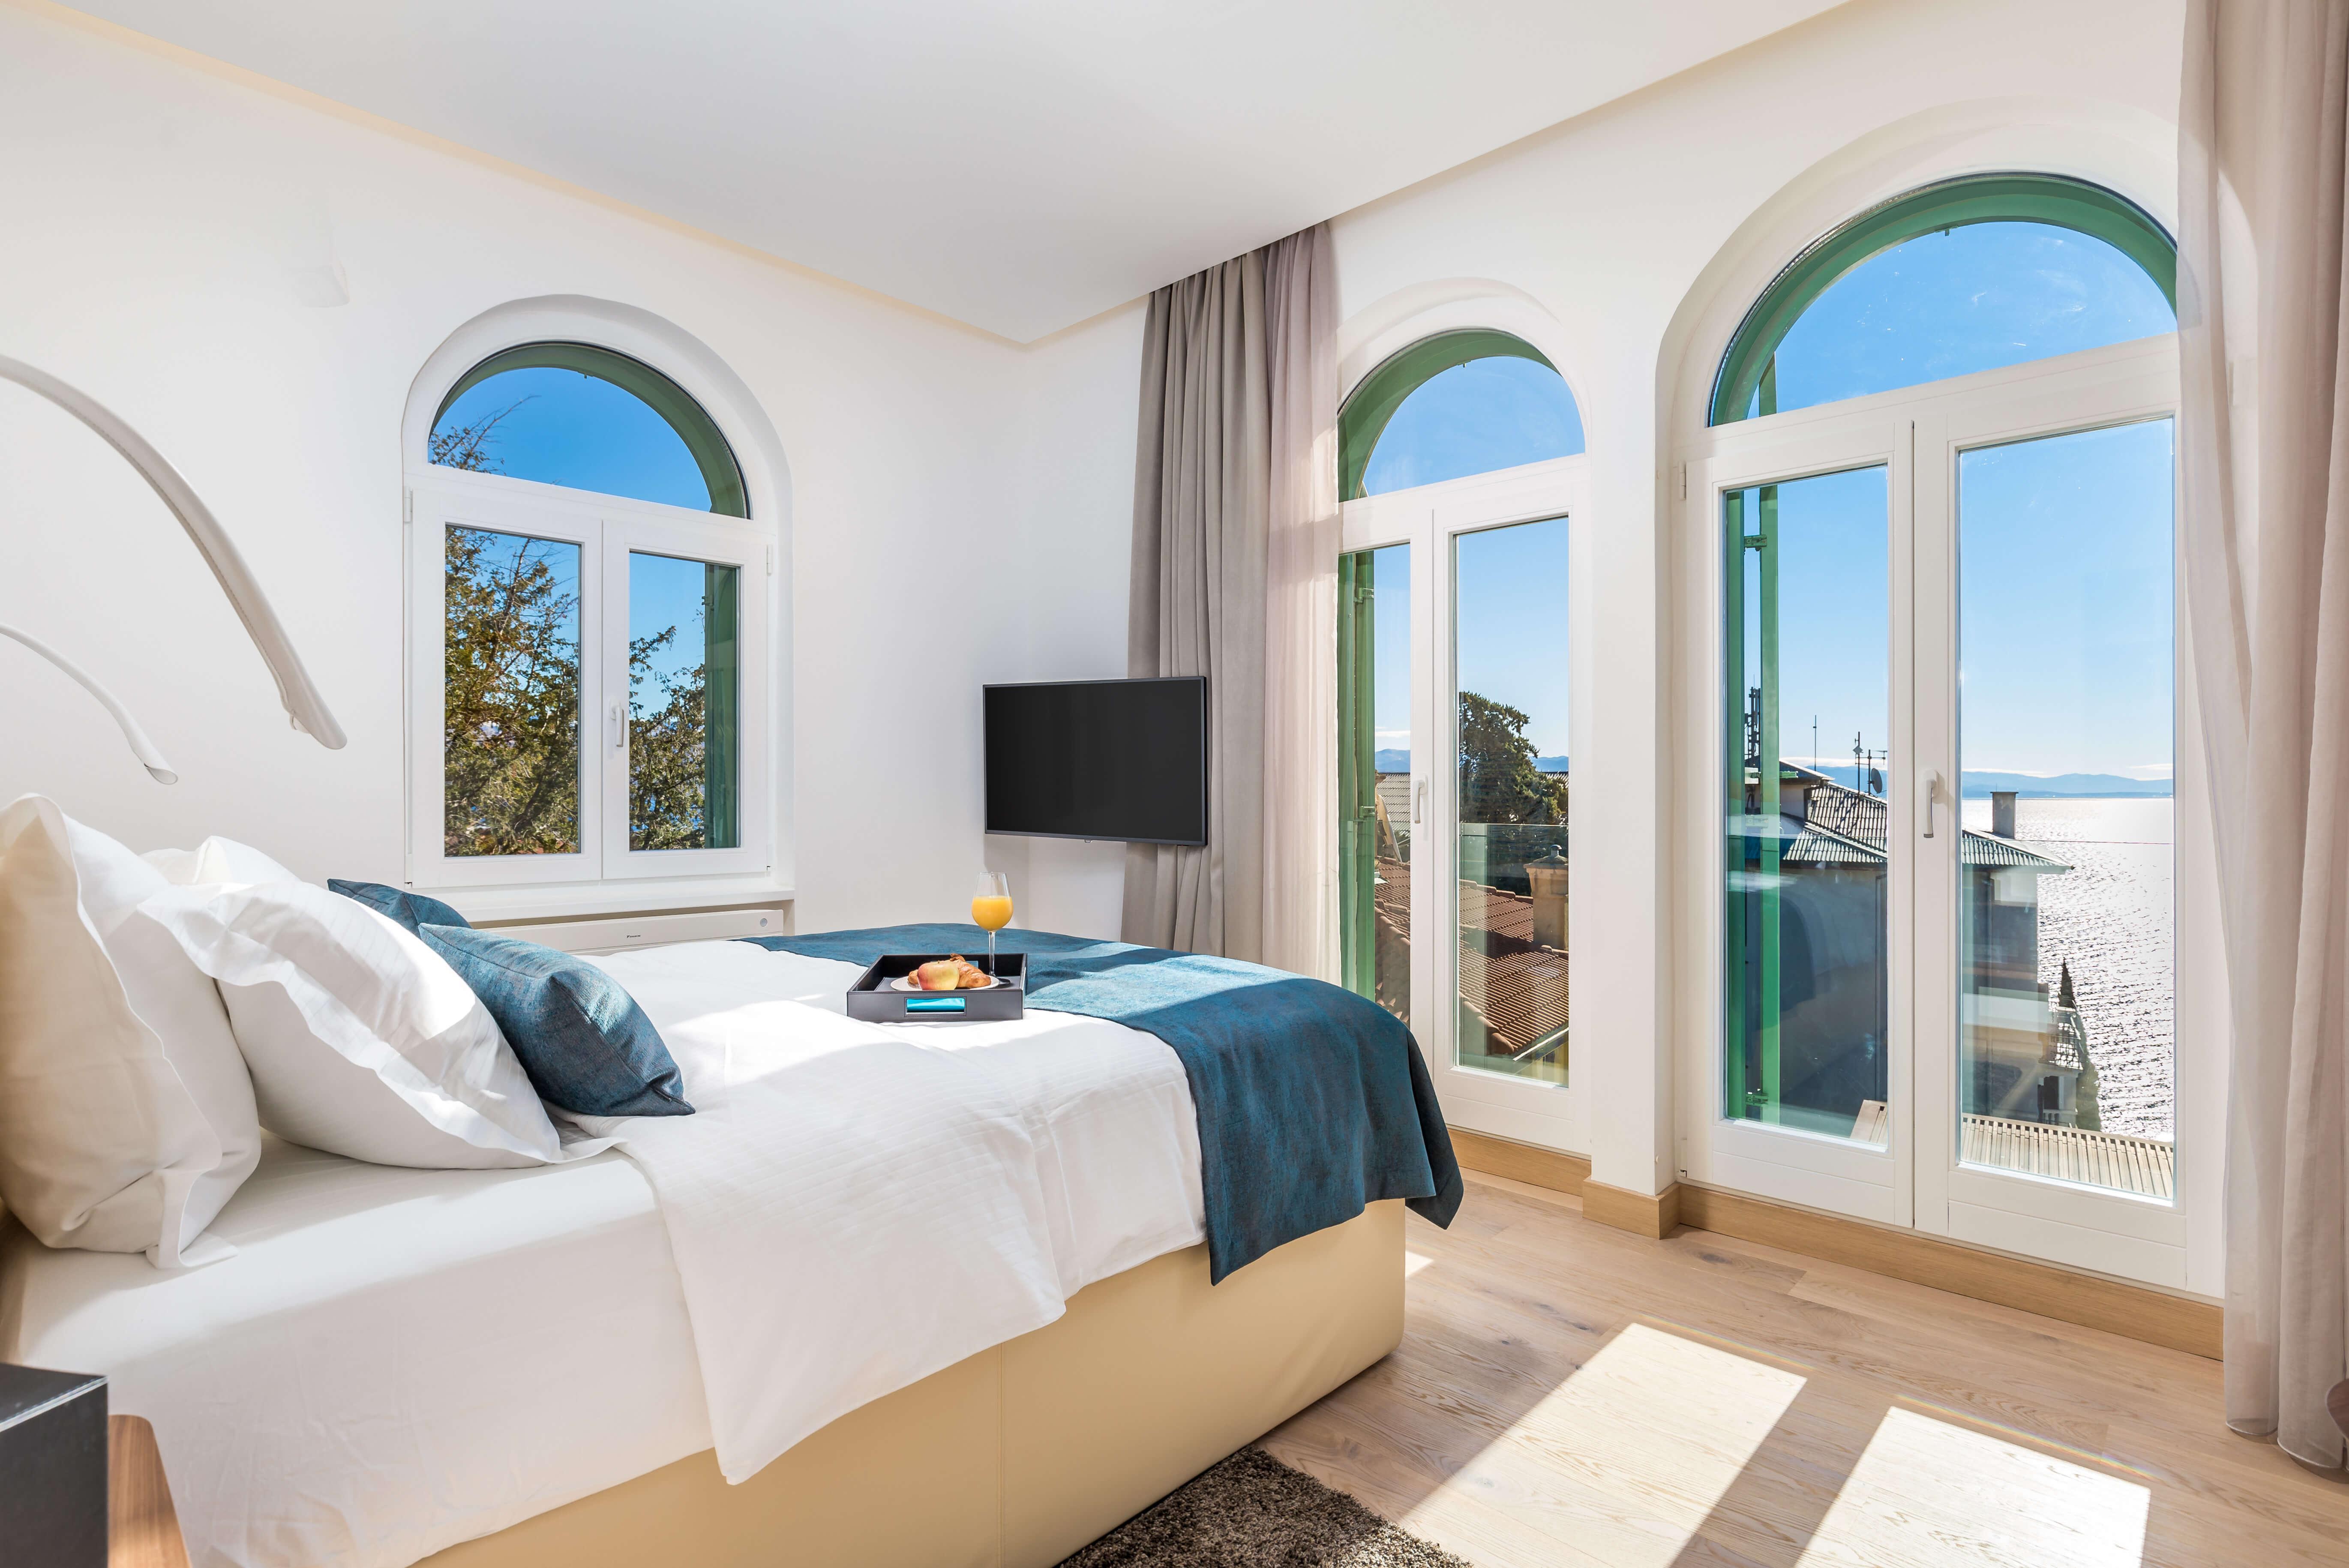 pogled, spavaća soba, king size krevet, francuski prozori, apartman OLA